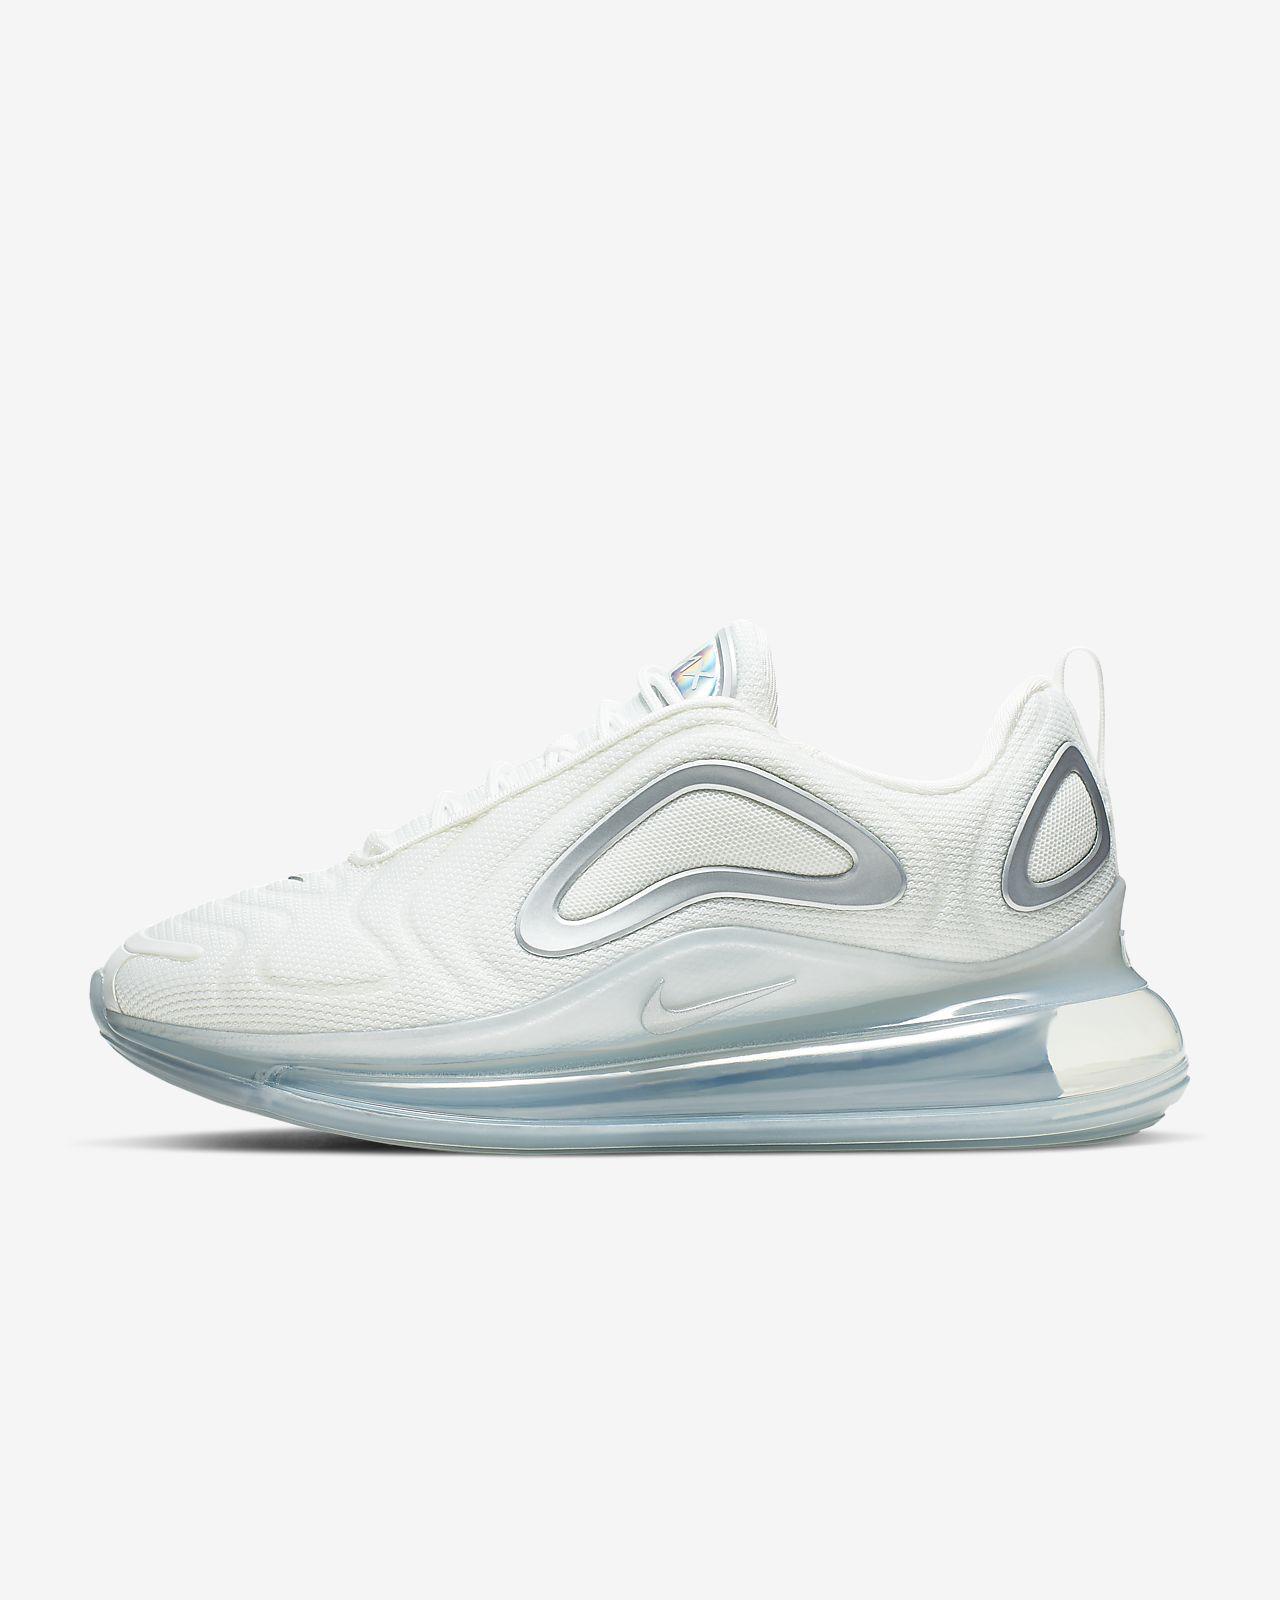 2nike 720 donna scarpe